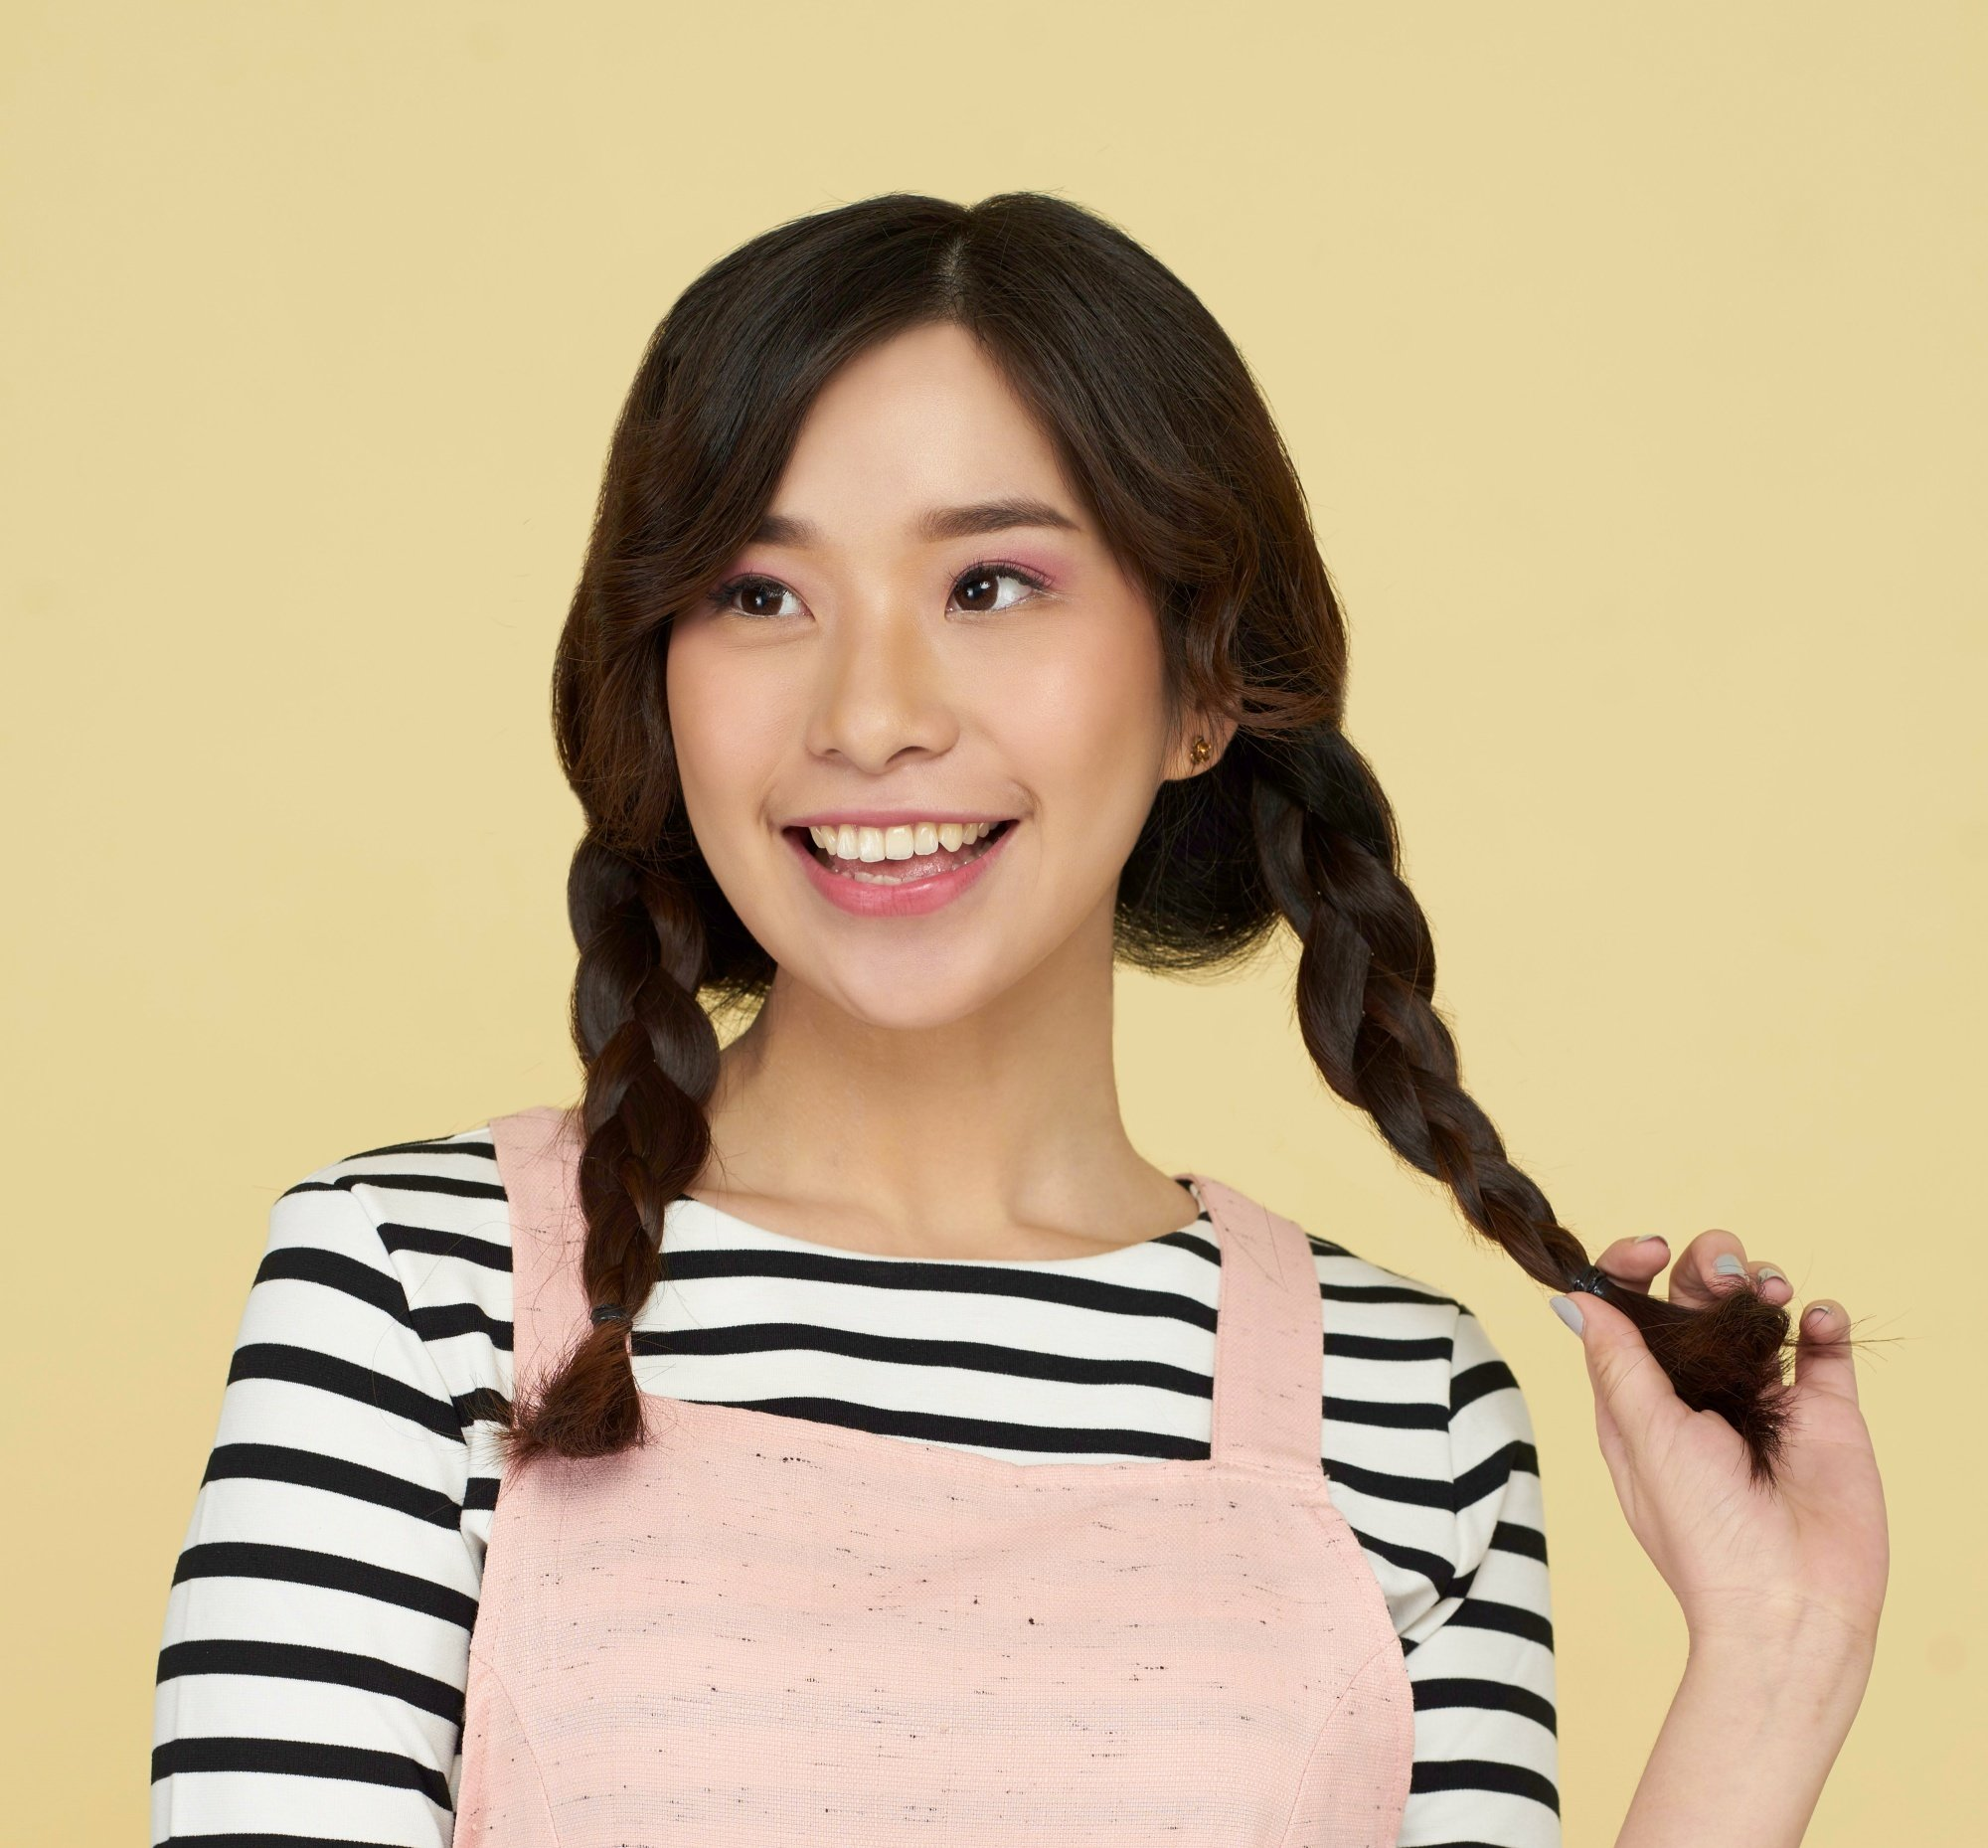 Summer braids: Closeup shot of an Asian woman with long dark brown hair in two braids wearing a striped shirt